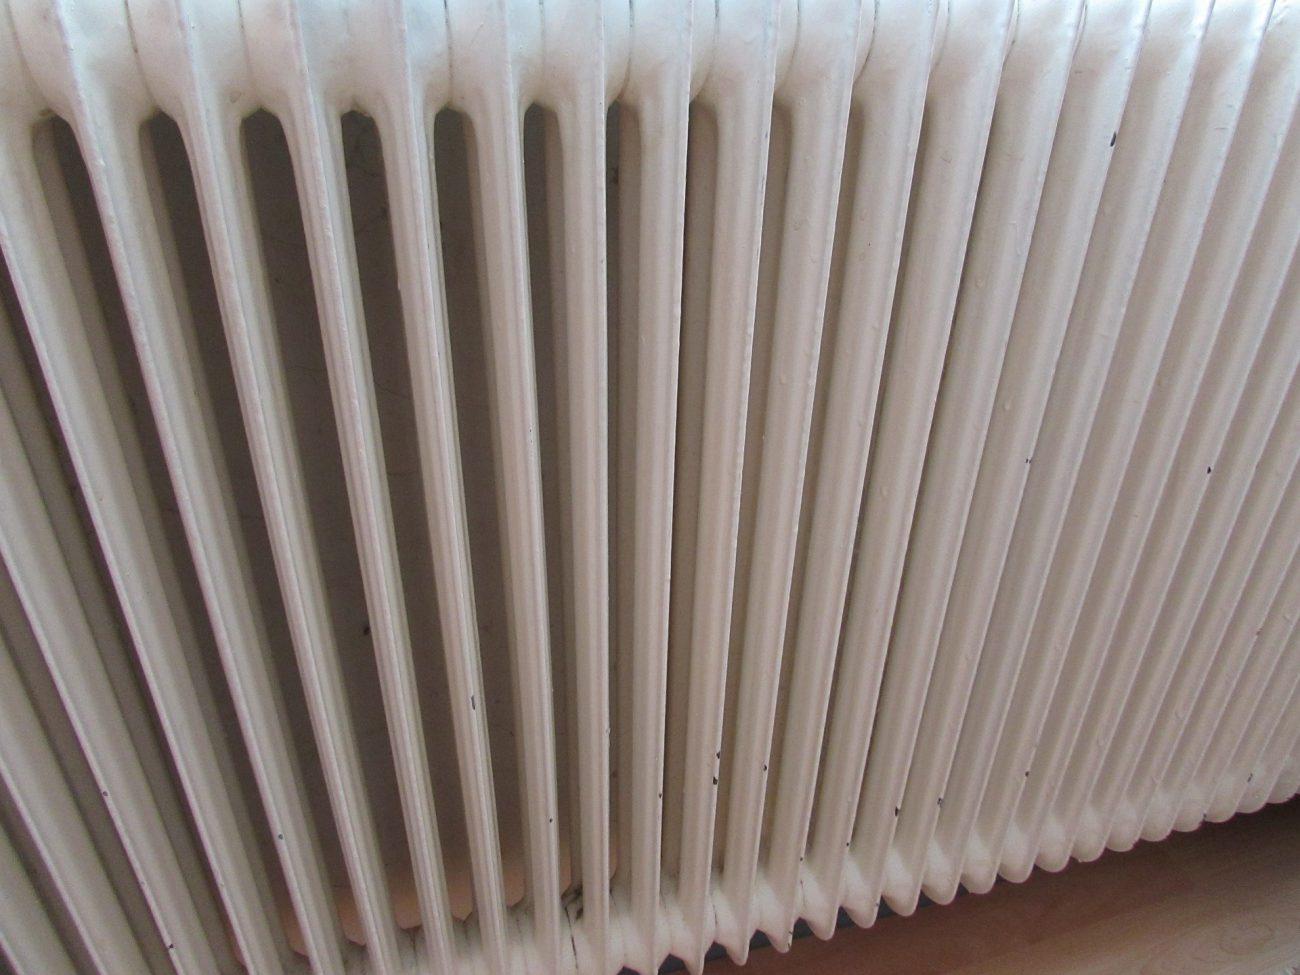 heating-463496_1920